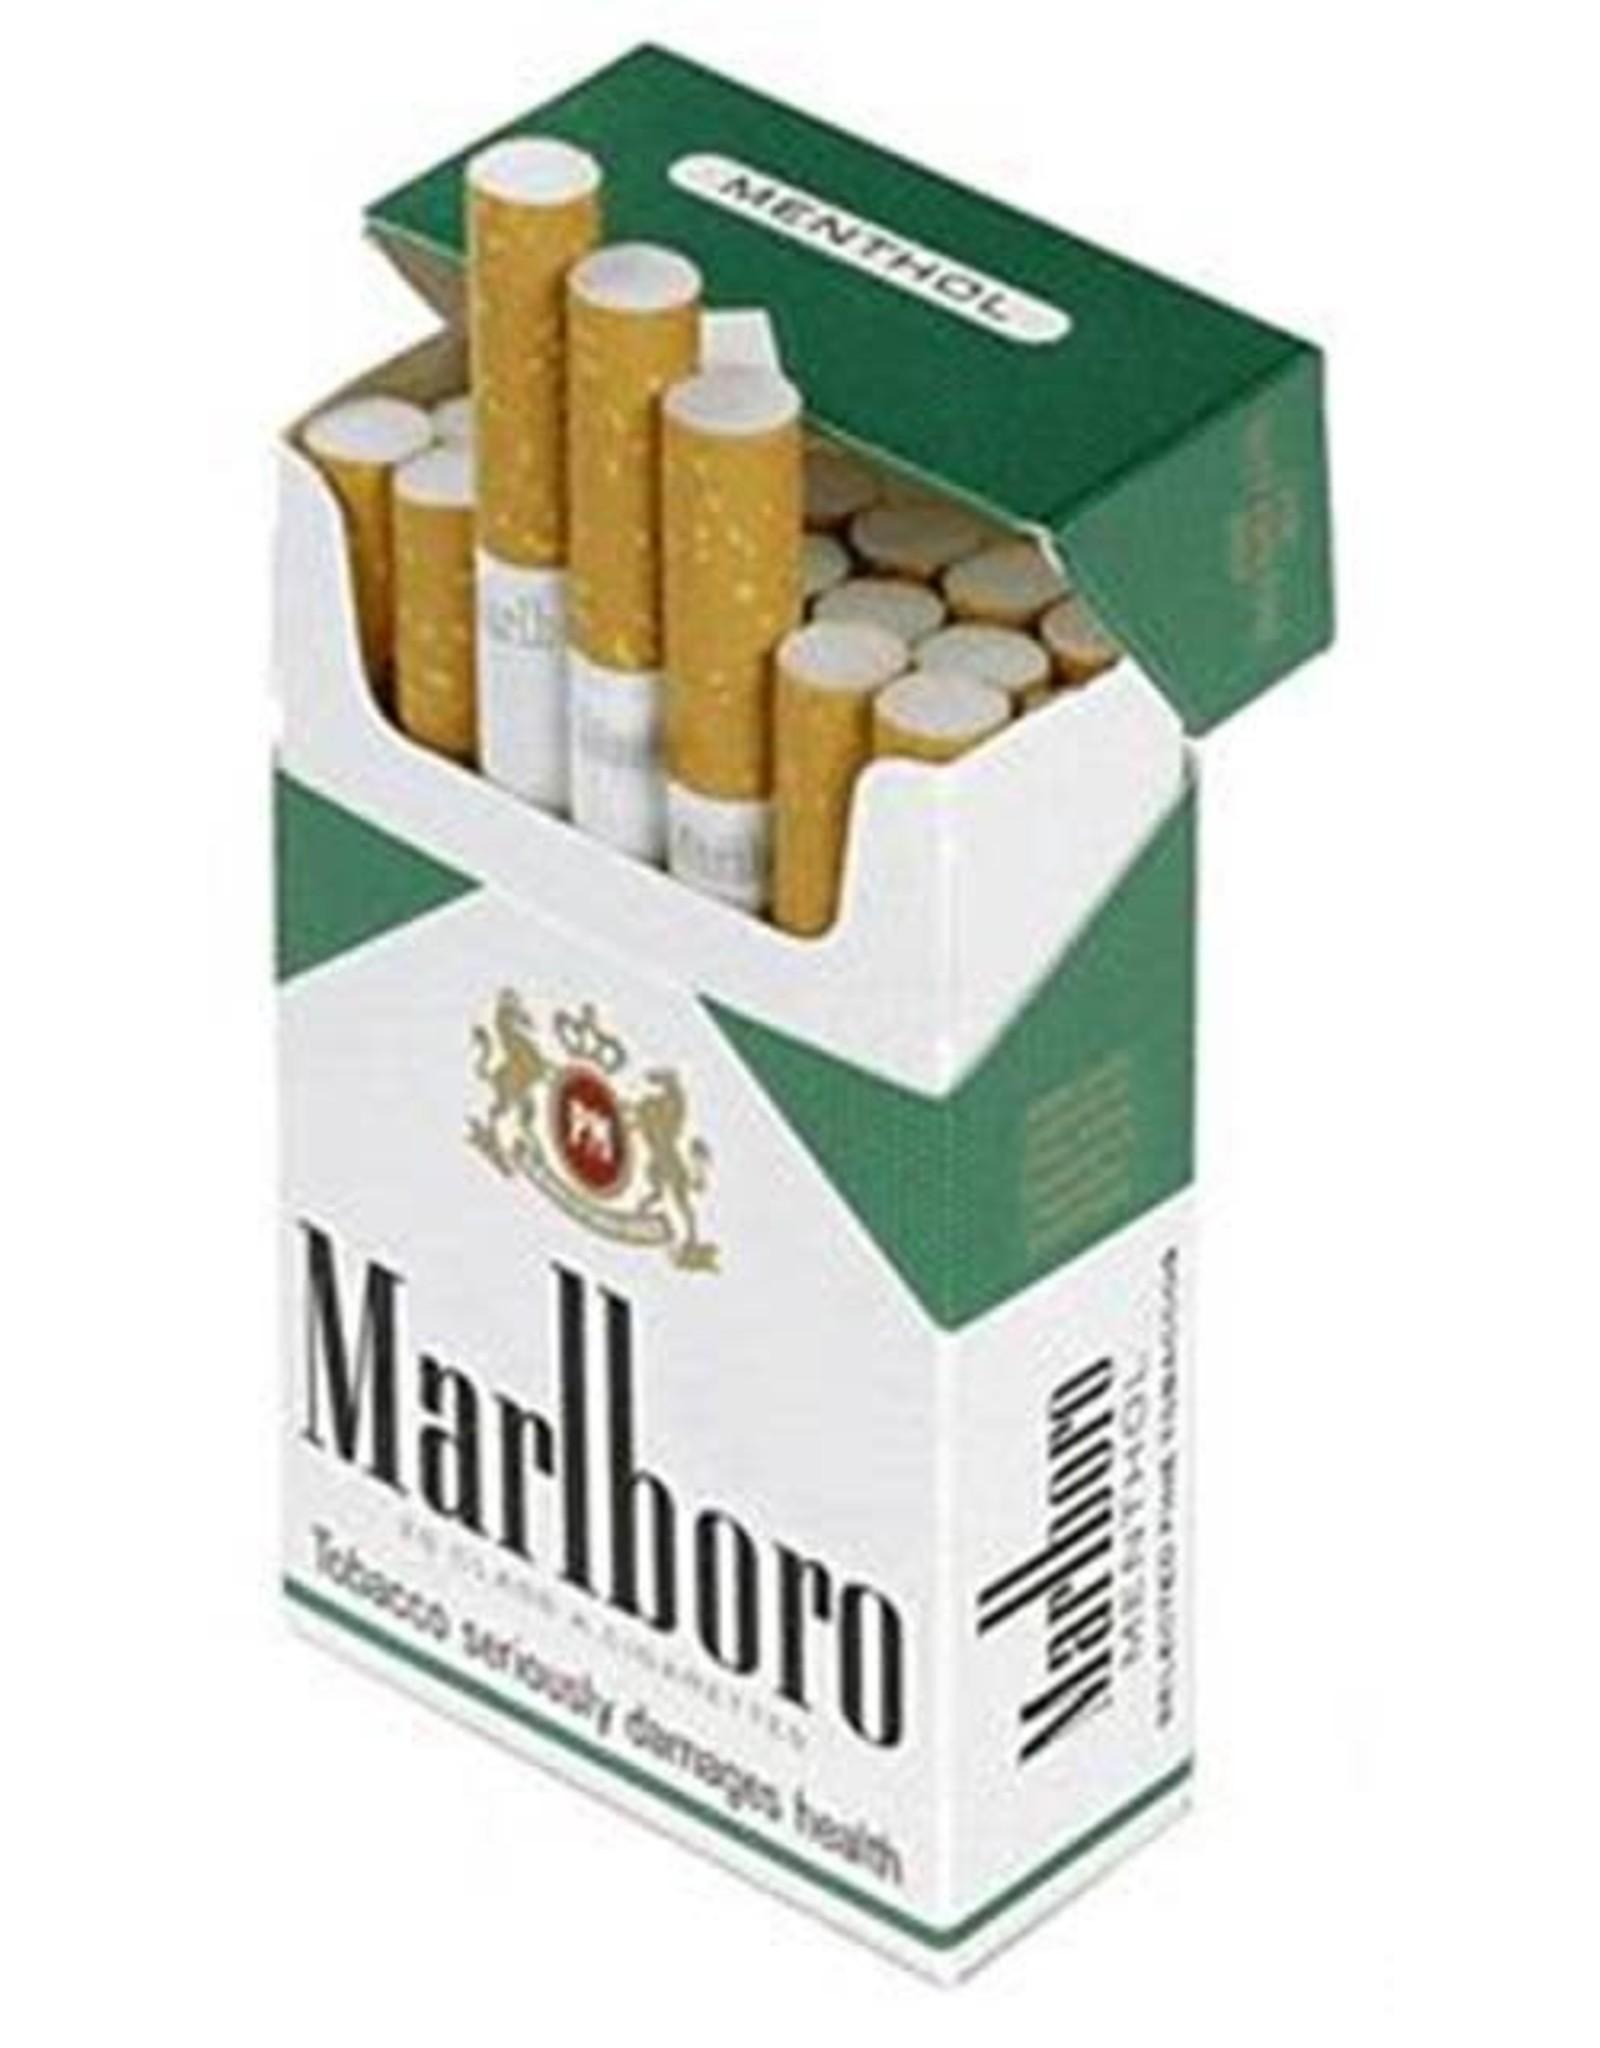 MARLBORO MENTHOL BOX